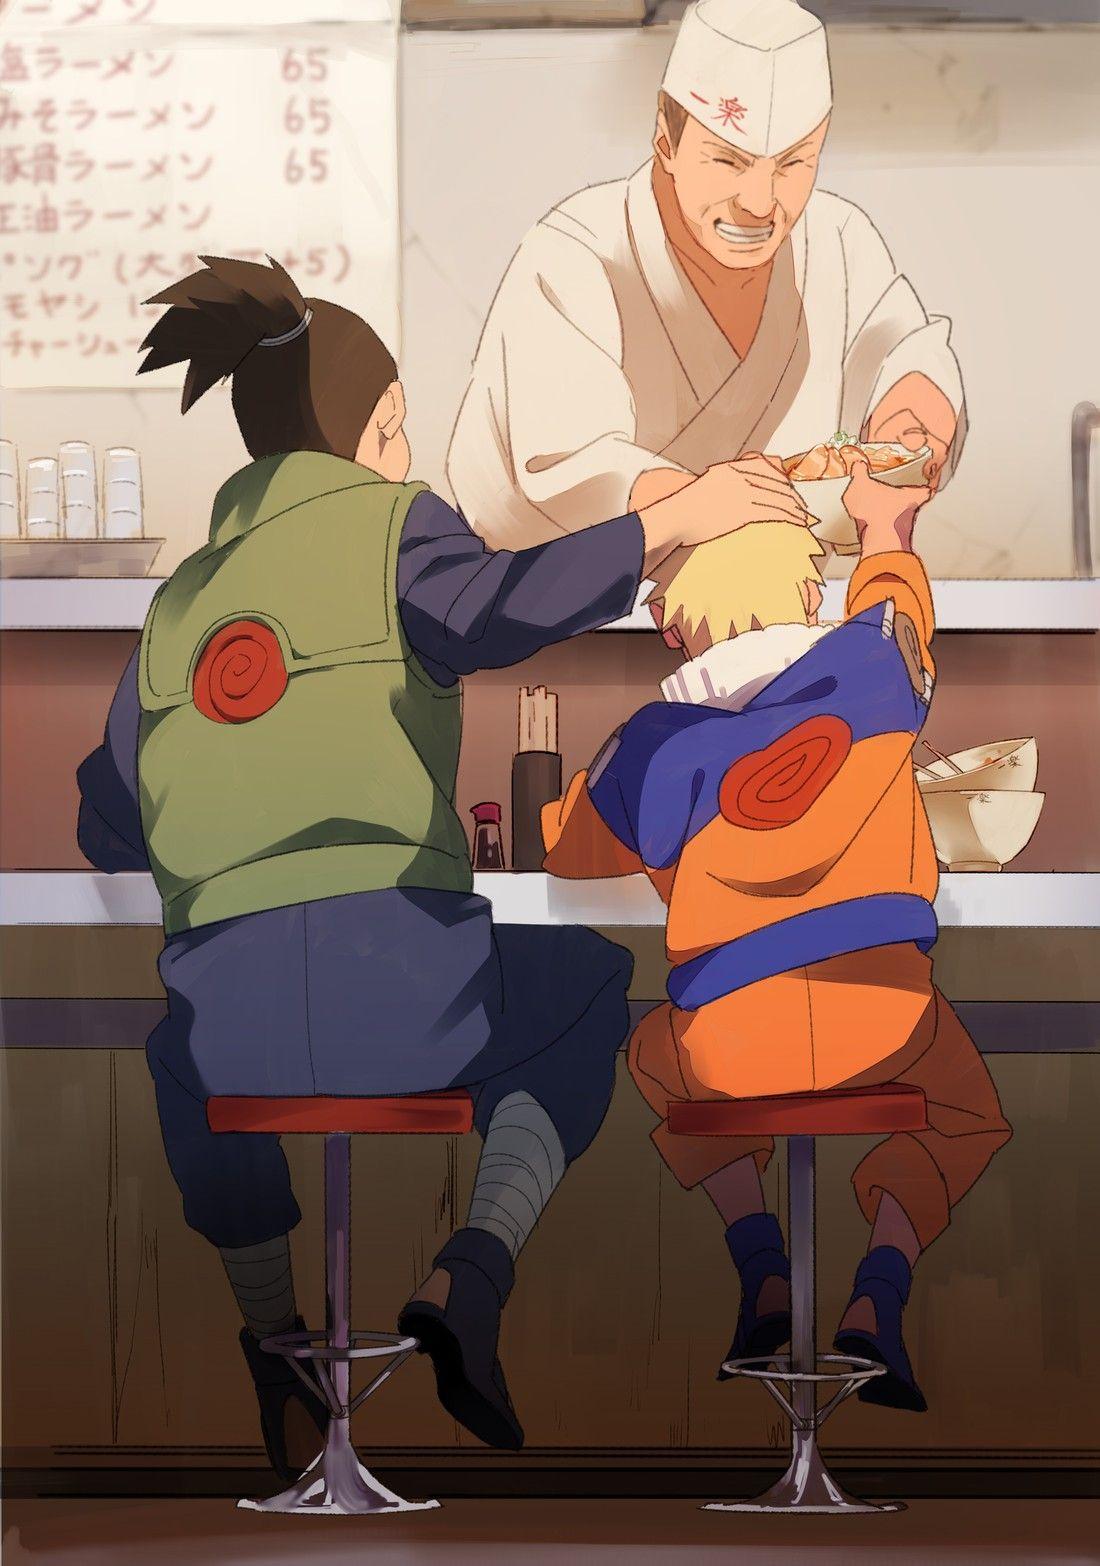 Naruto with Iruka eating ramen -Sure brings back memories ☺️ #narutowallpaper